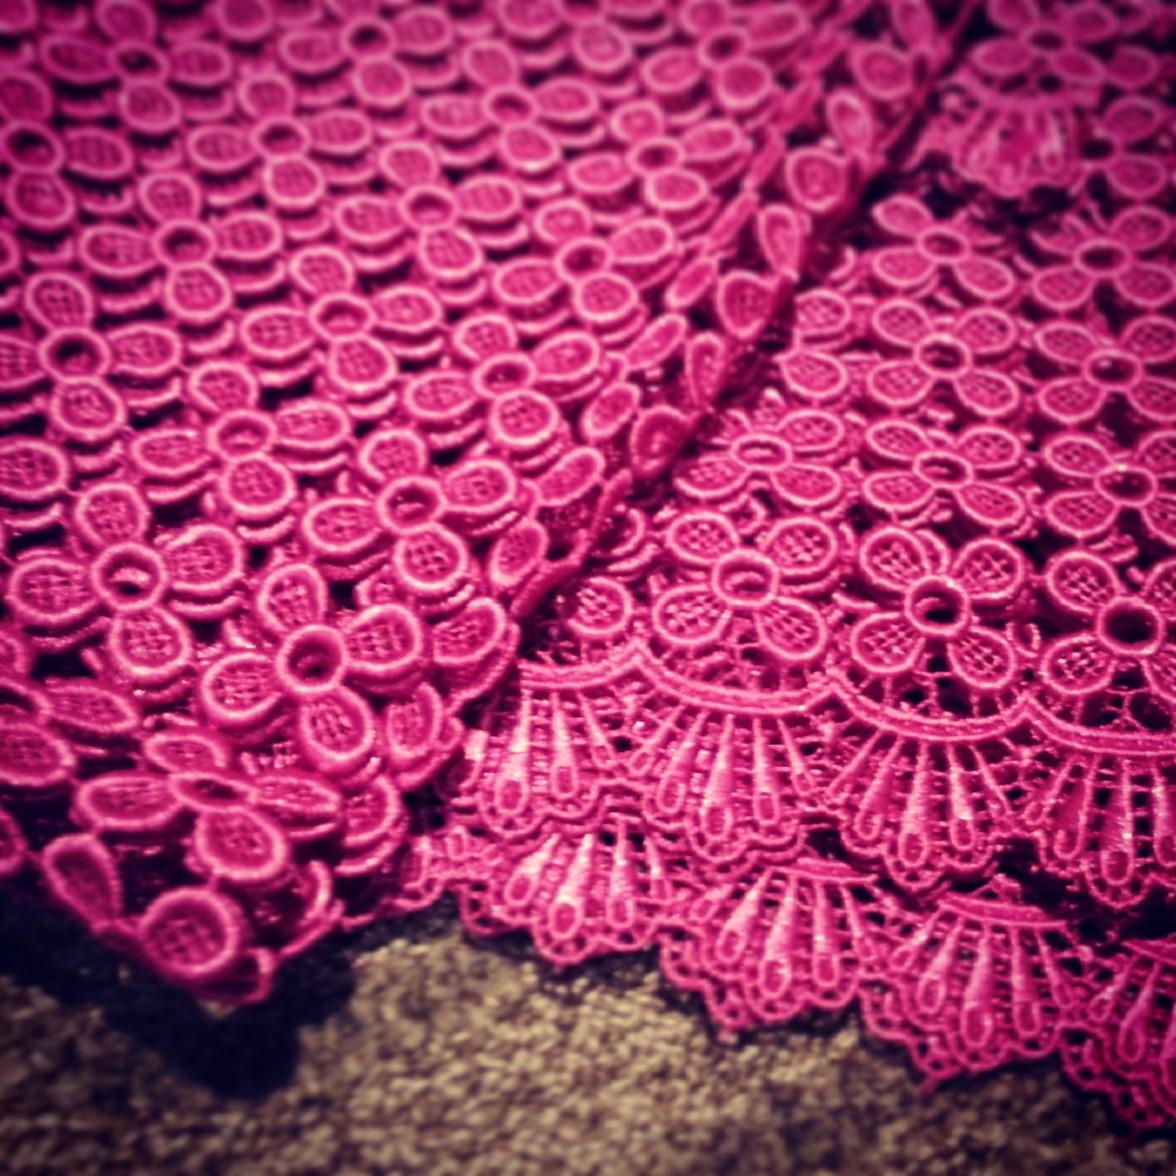 Cotton lace from Kamdar in Mid-Valley Mega Mall, Kuala Lumpar Malaysia